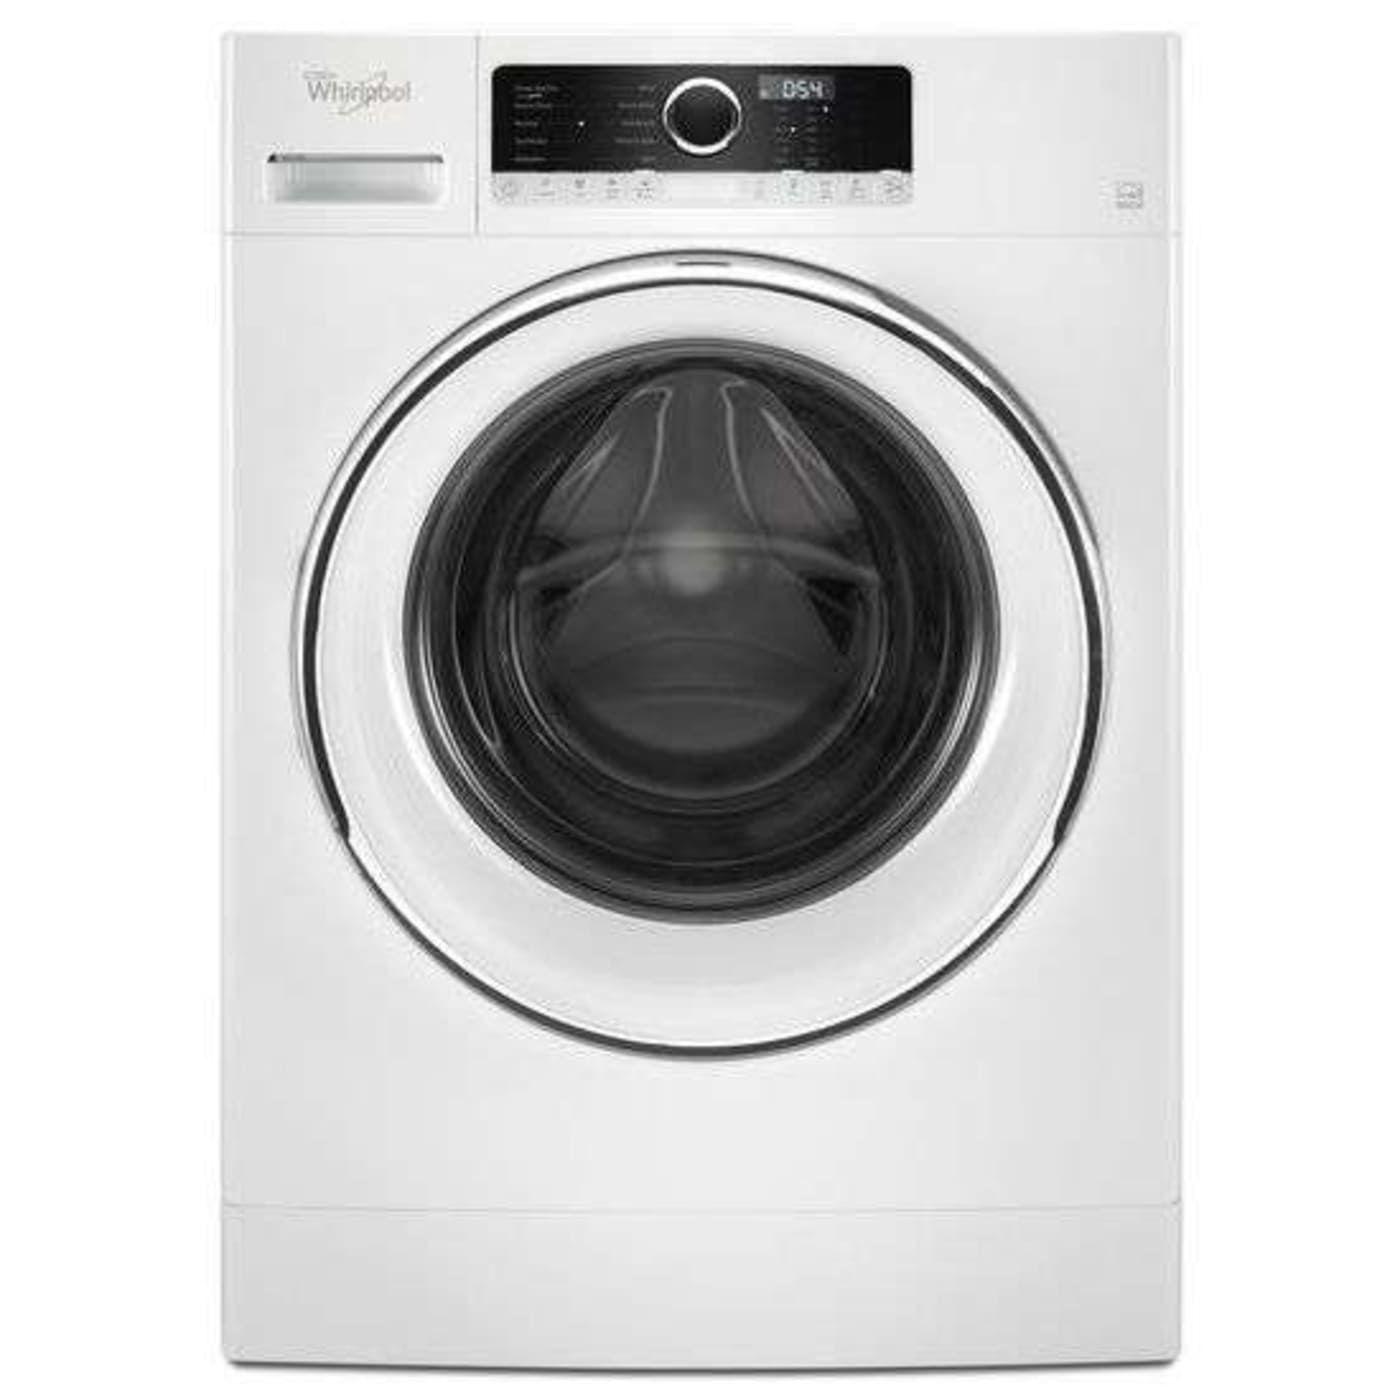 Pin On Whirlpool Appliances